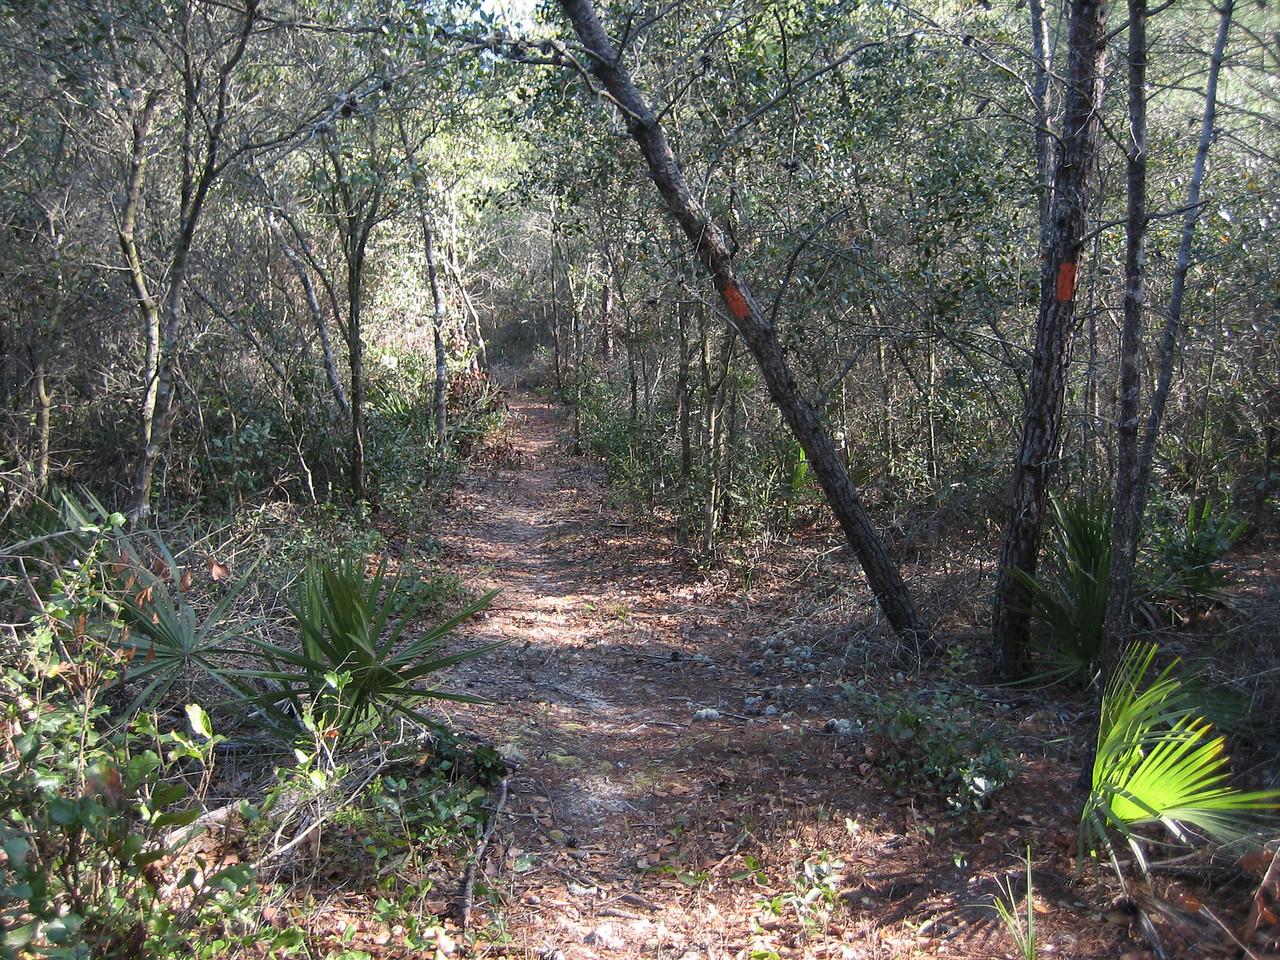 The footpath through the scrub forest<br /> photo credit: Sandra Friend / Florida Trail Association